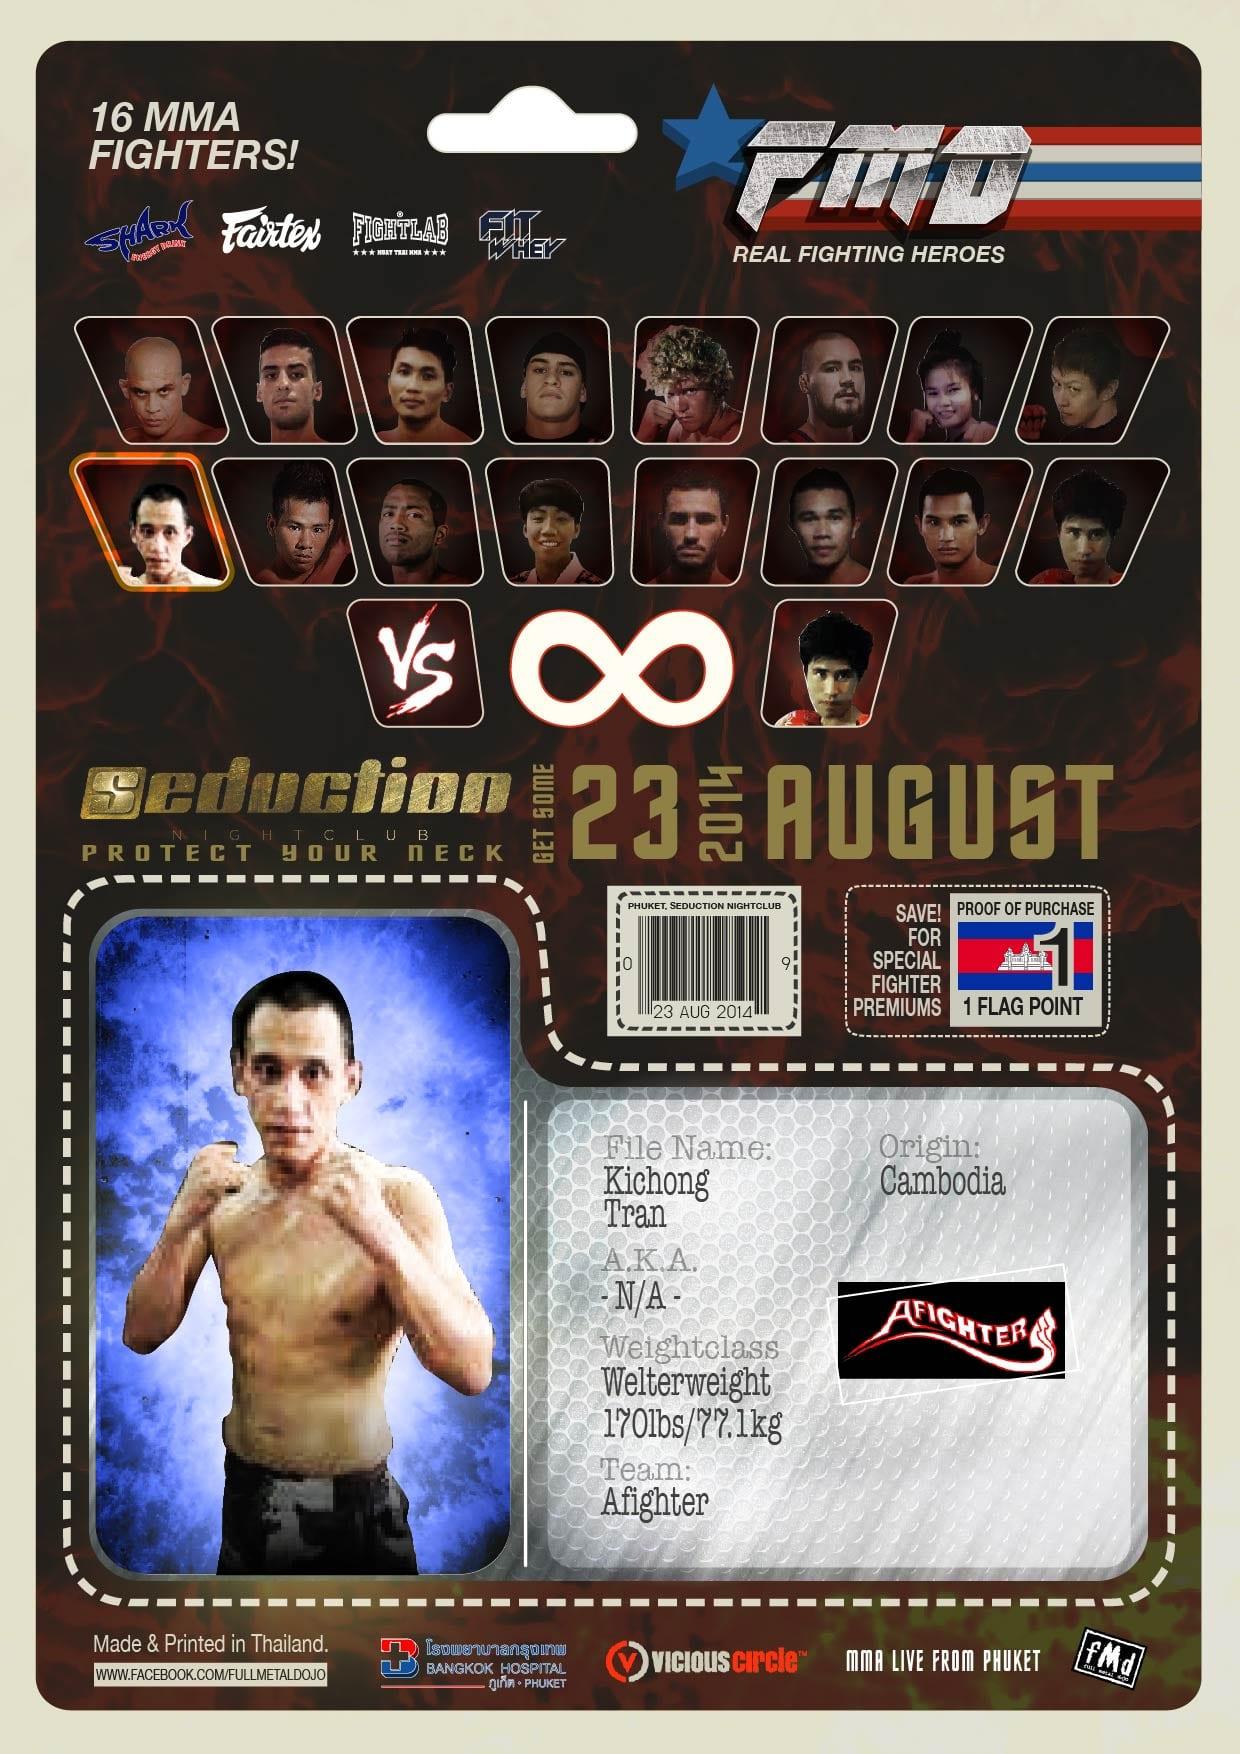 Kichong Tran FMD2 MMA Fighter